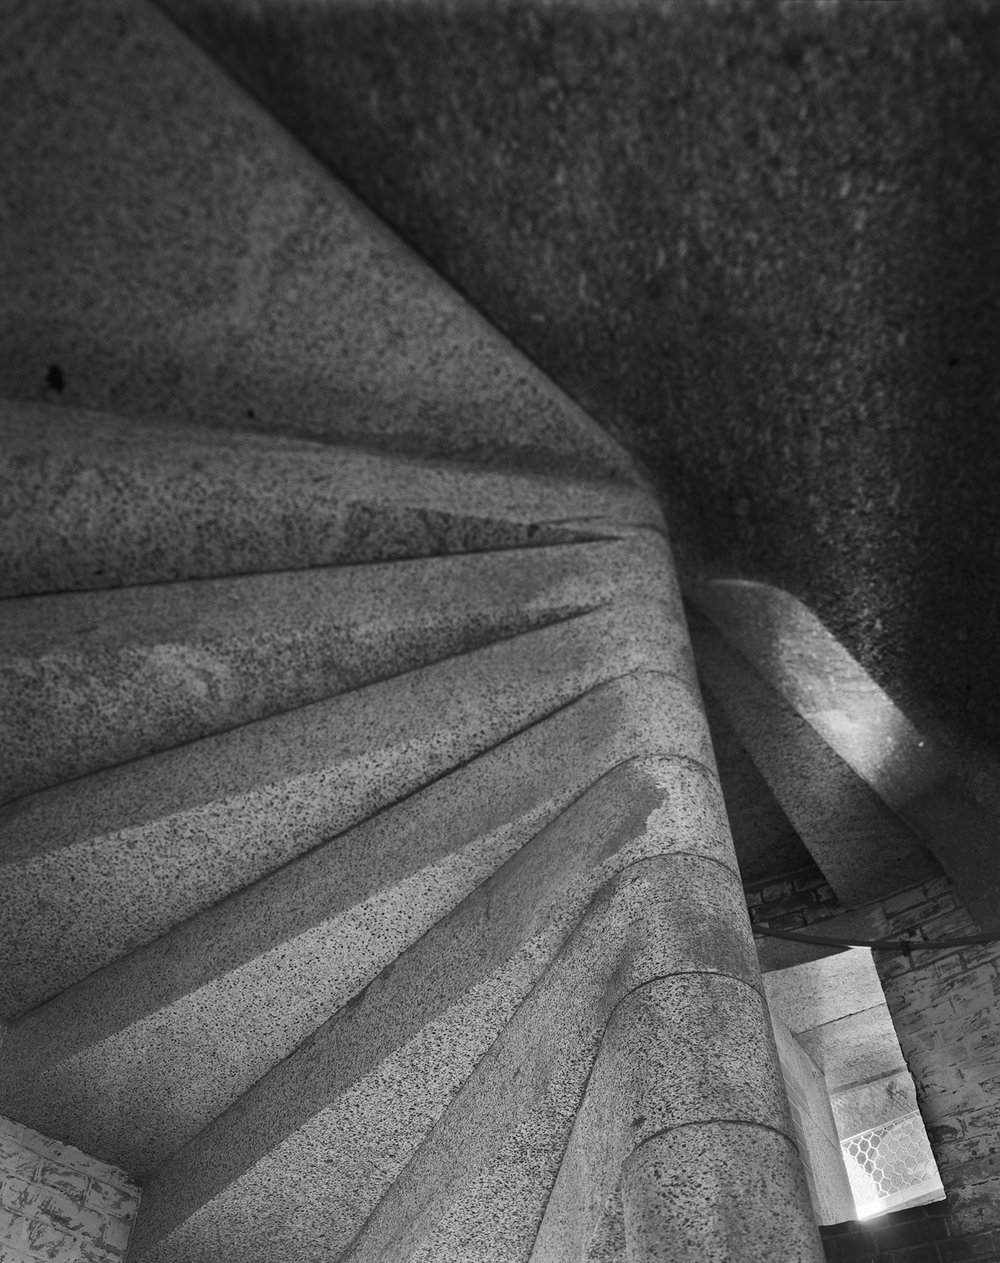 161020 East Stairs Window f32*90 sec N-2 8x6 Print File.jpg